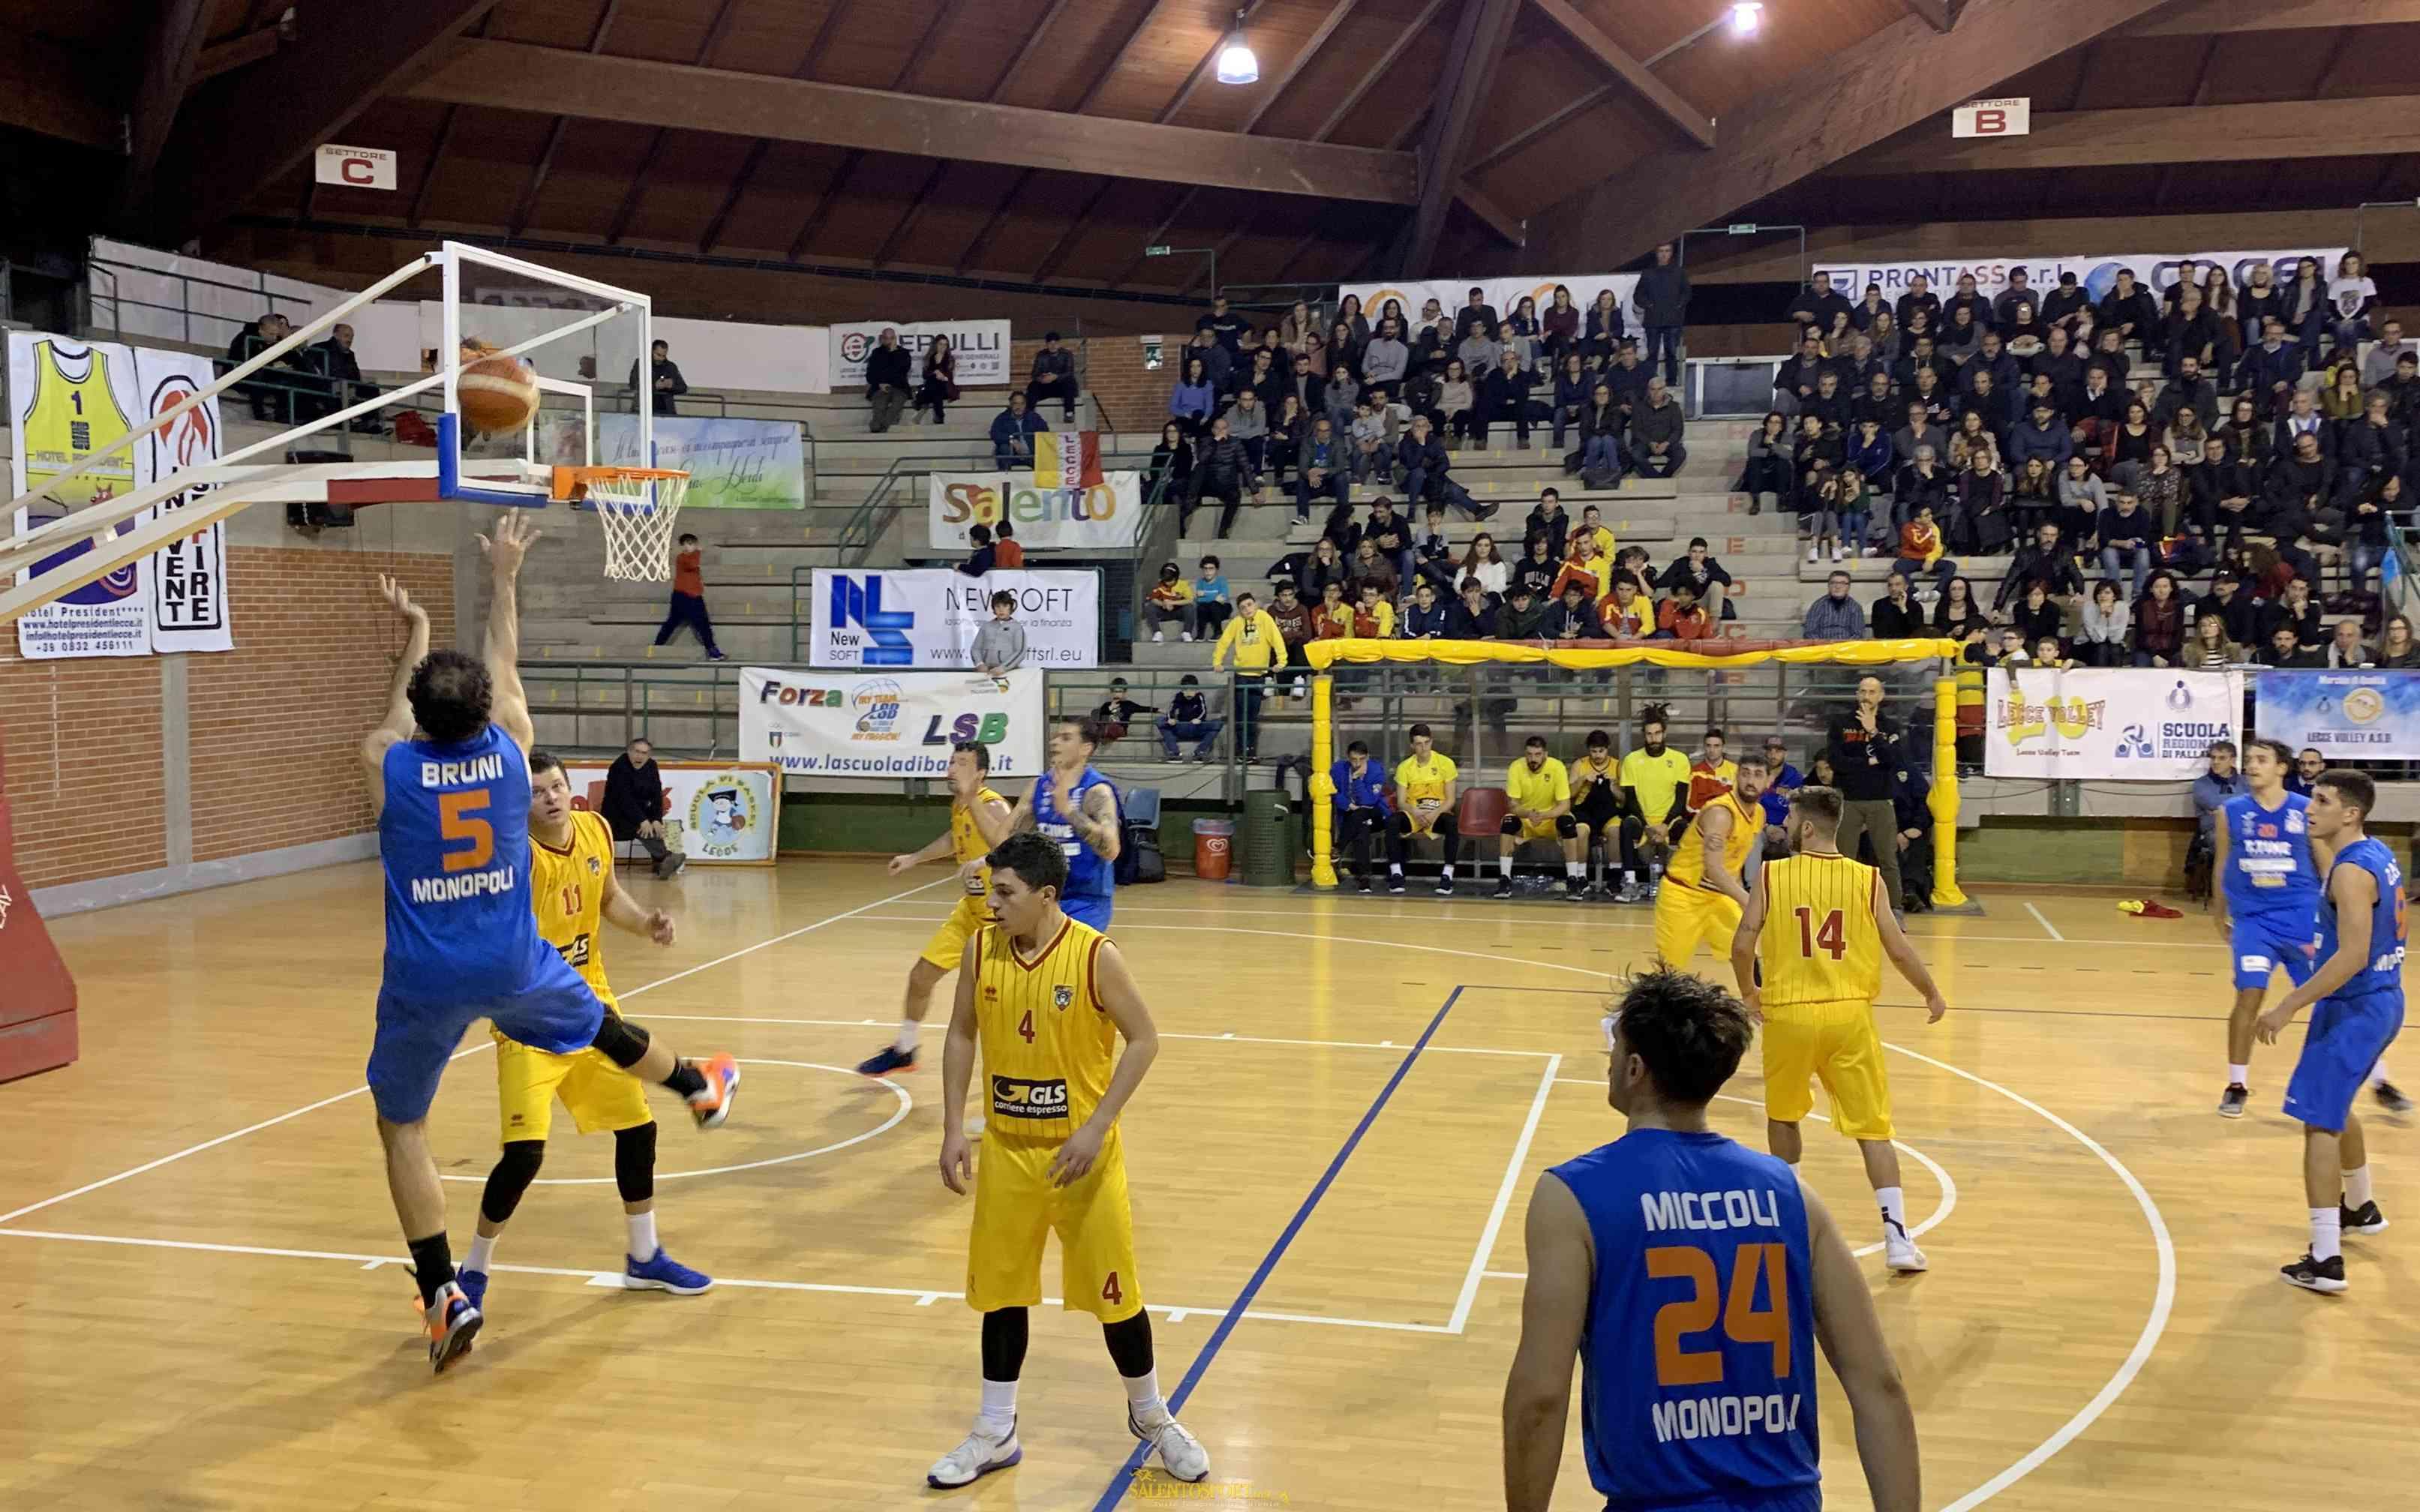 lupa-lecce-monopoli-basket 030219